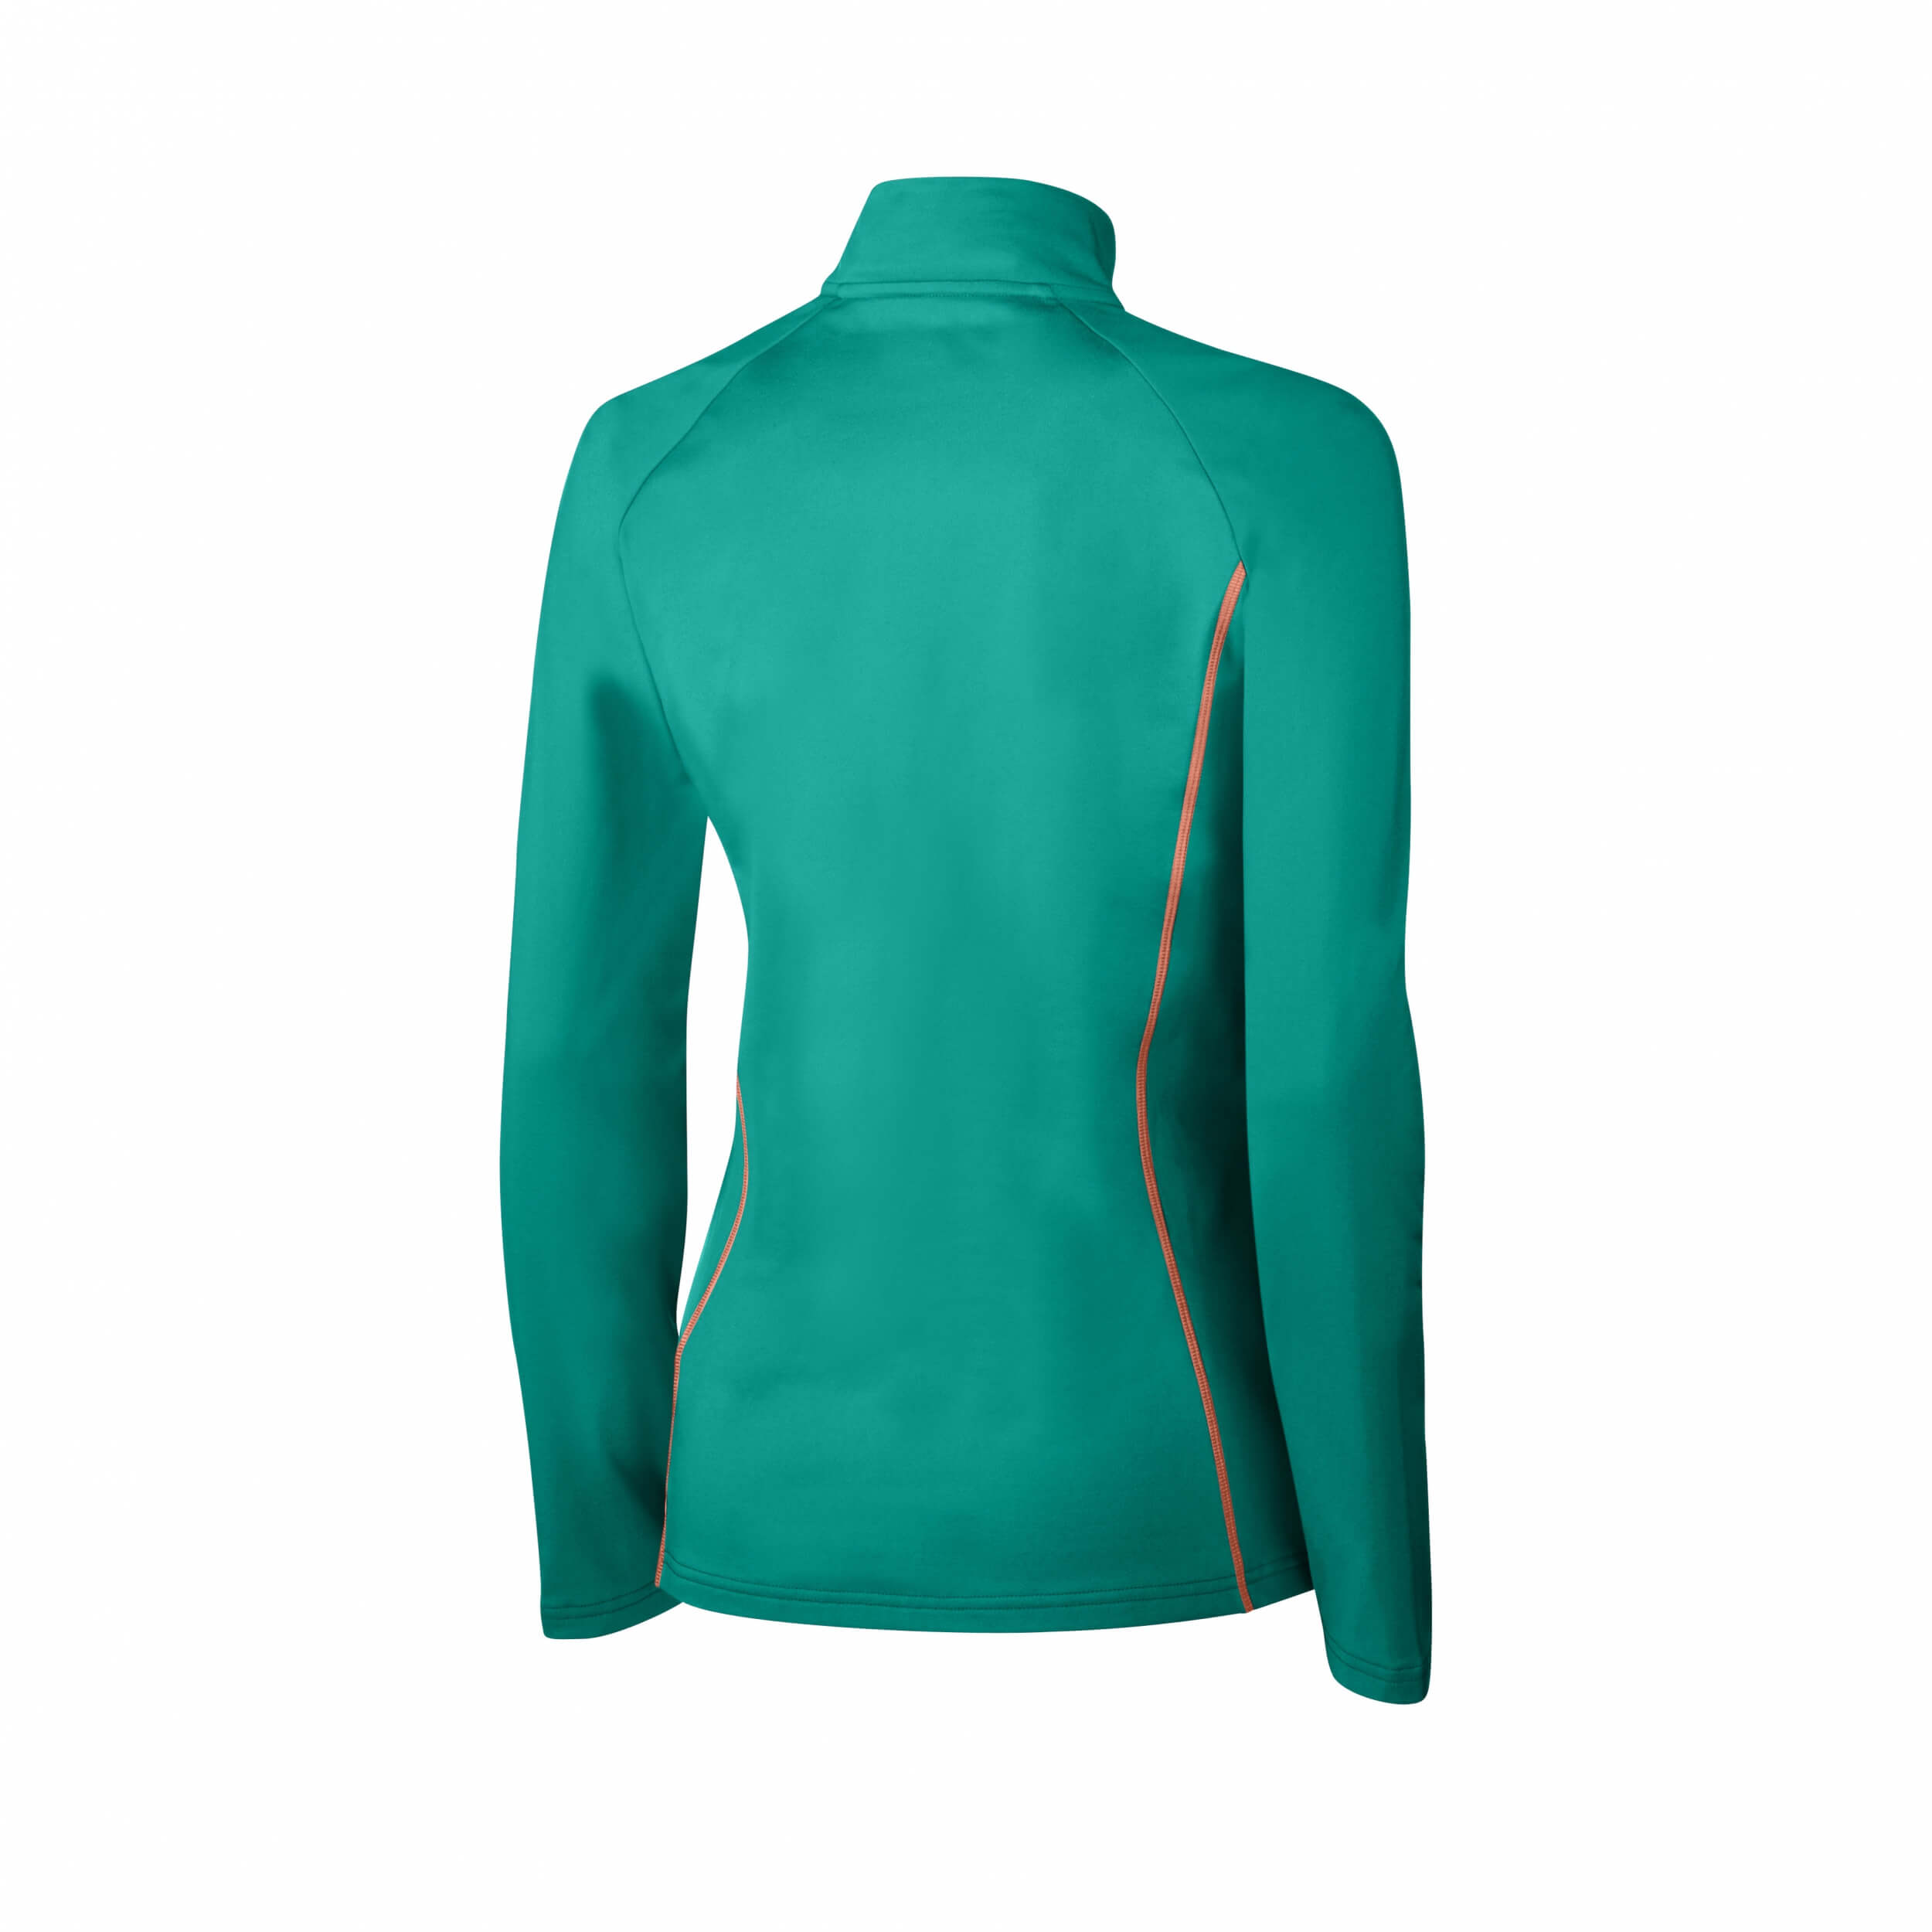 ZIENER Damen Shirt Josefa grün 836